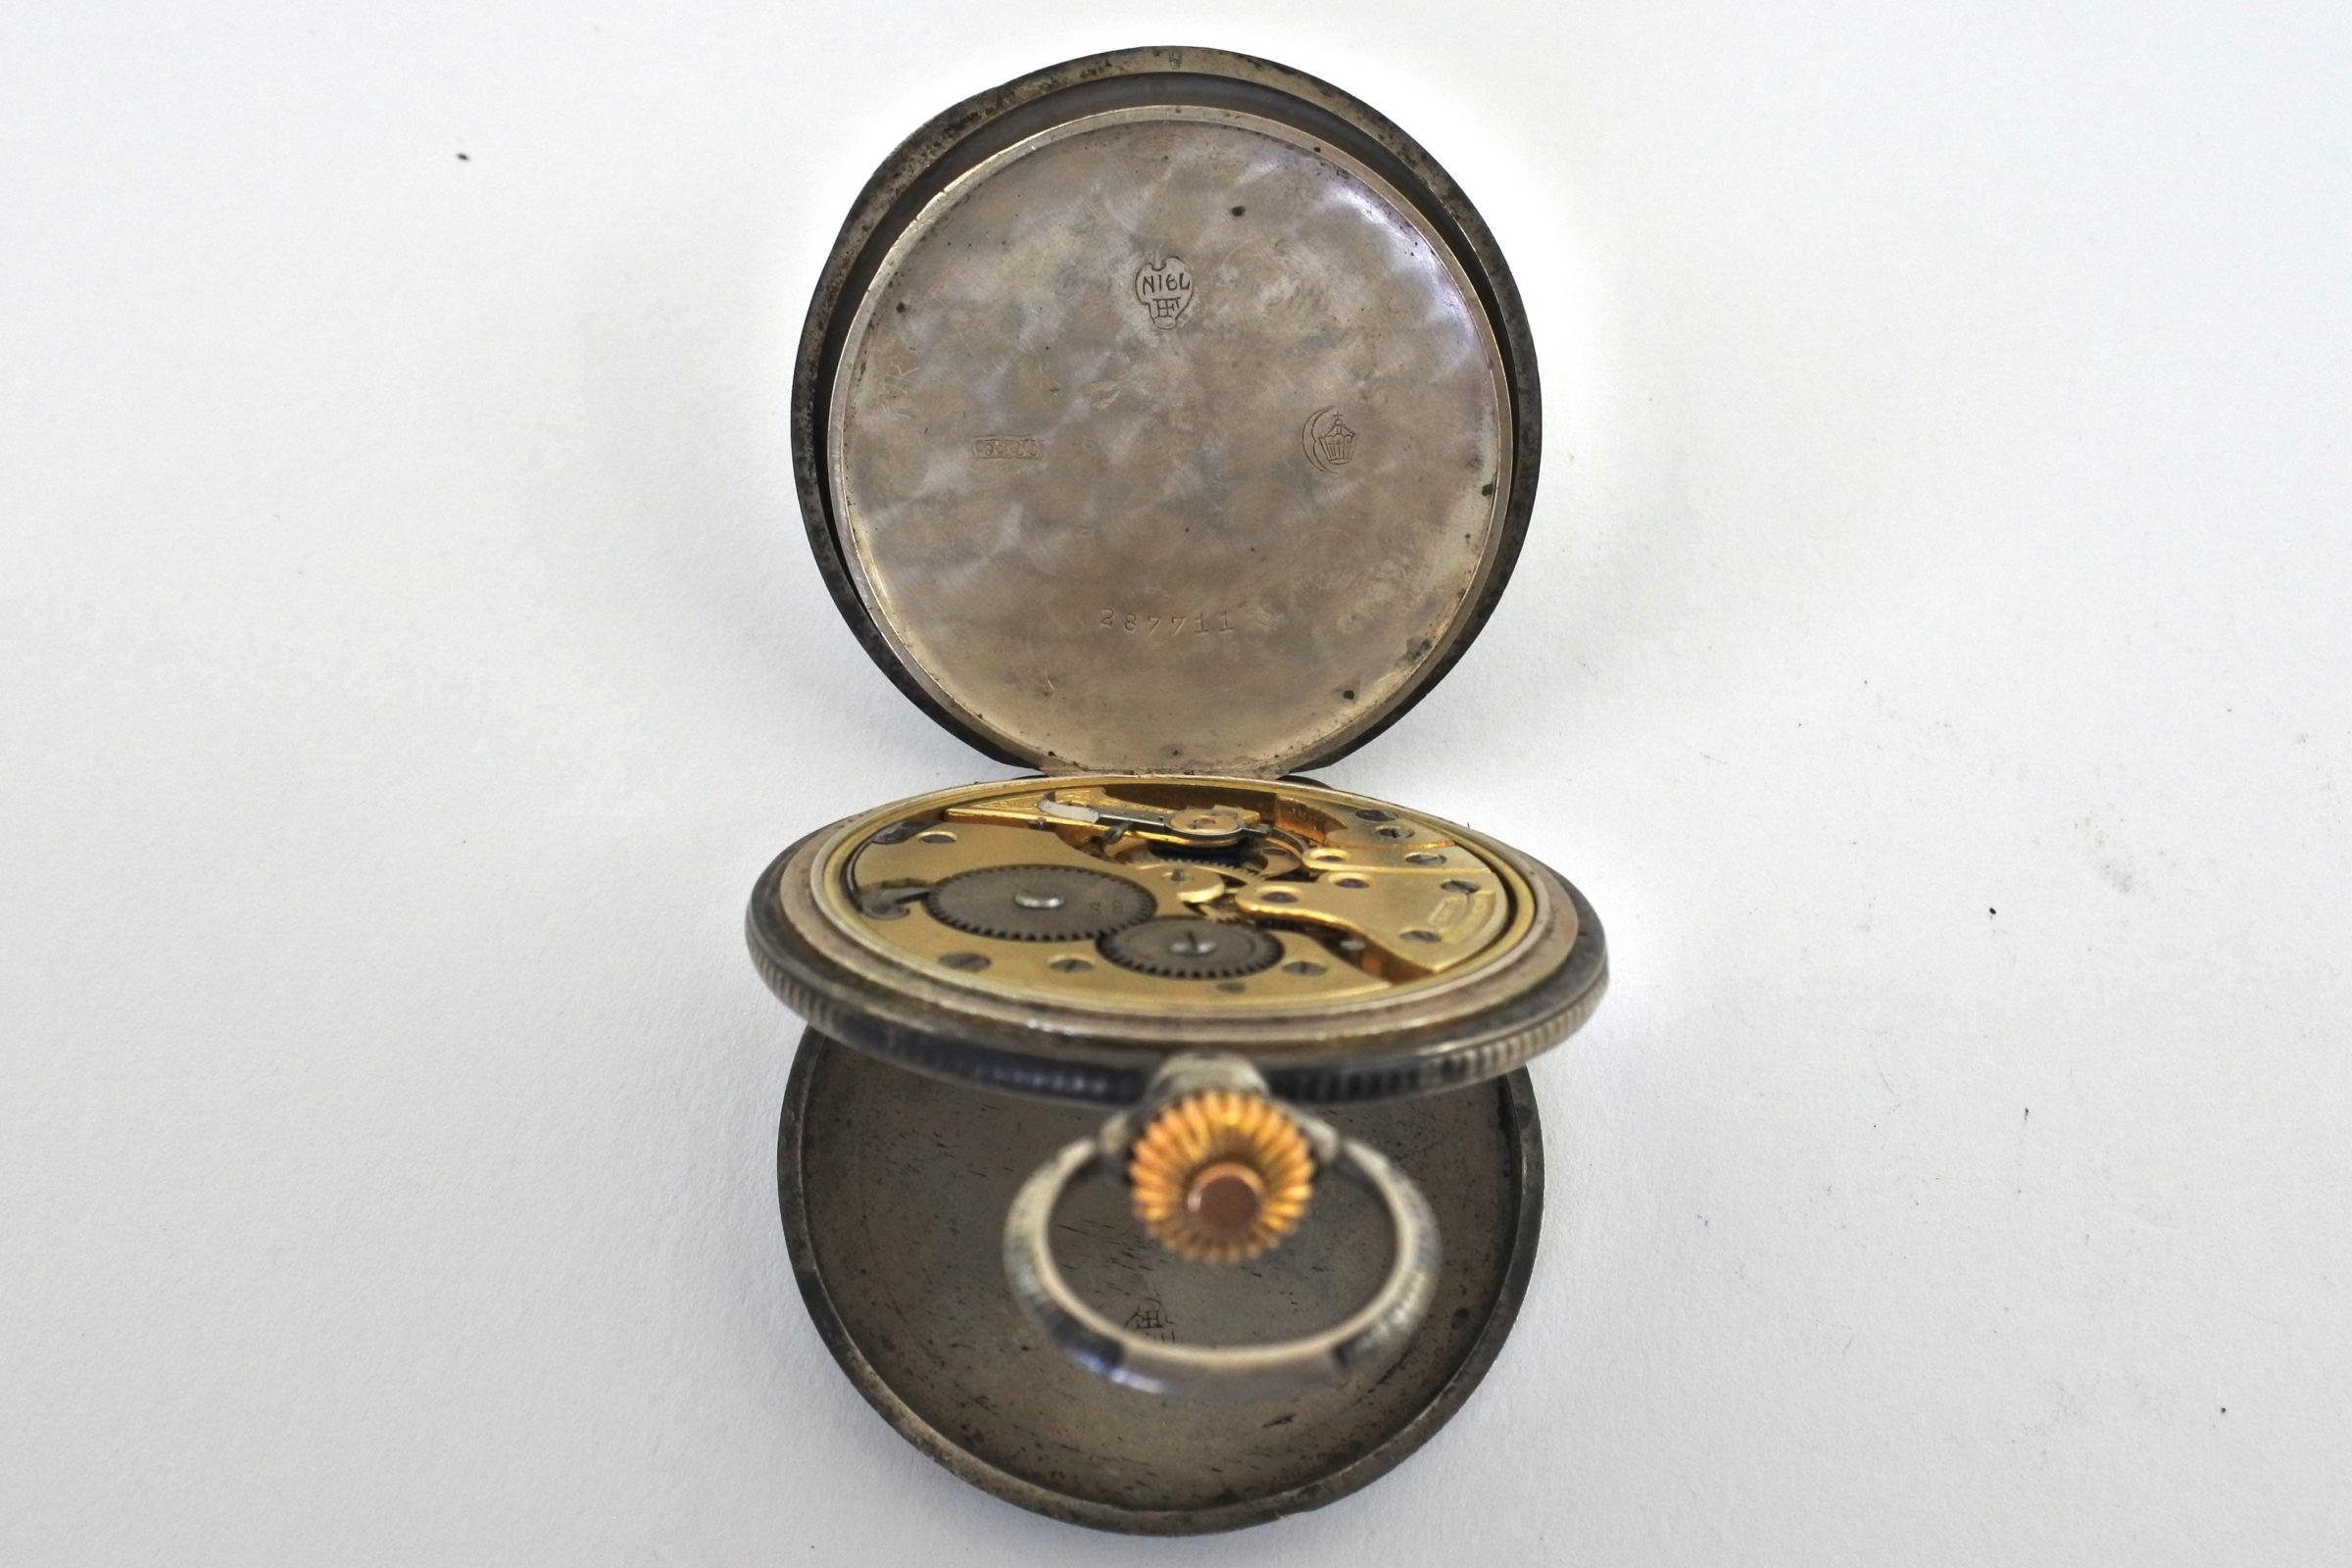 Orologio da tasca in argento e niello – Audemars Piguet Genève - 5